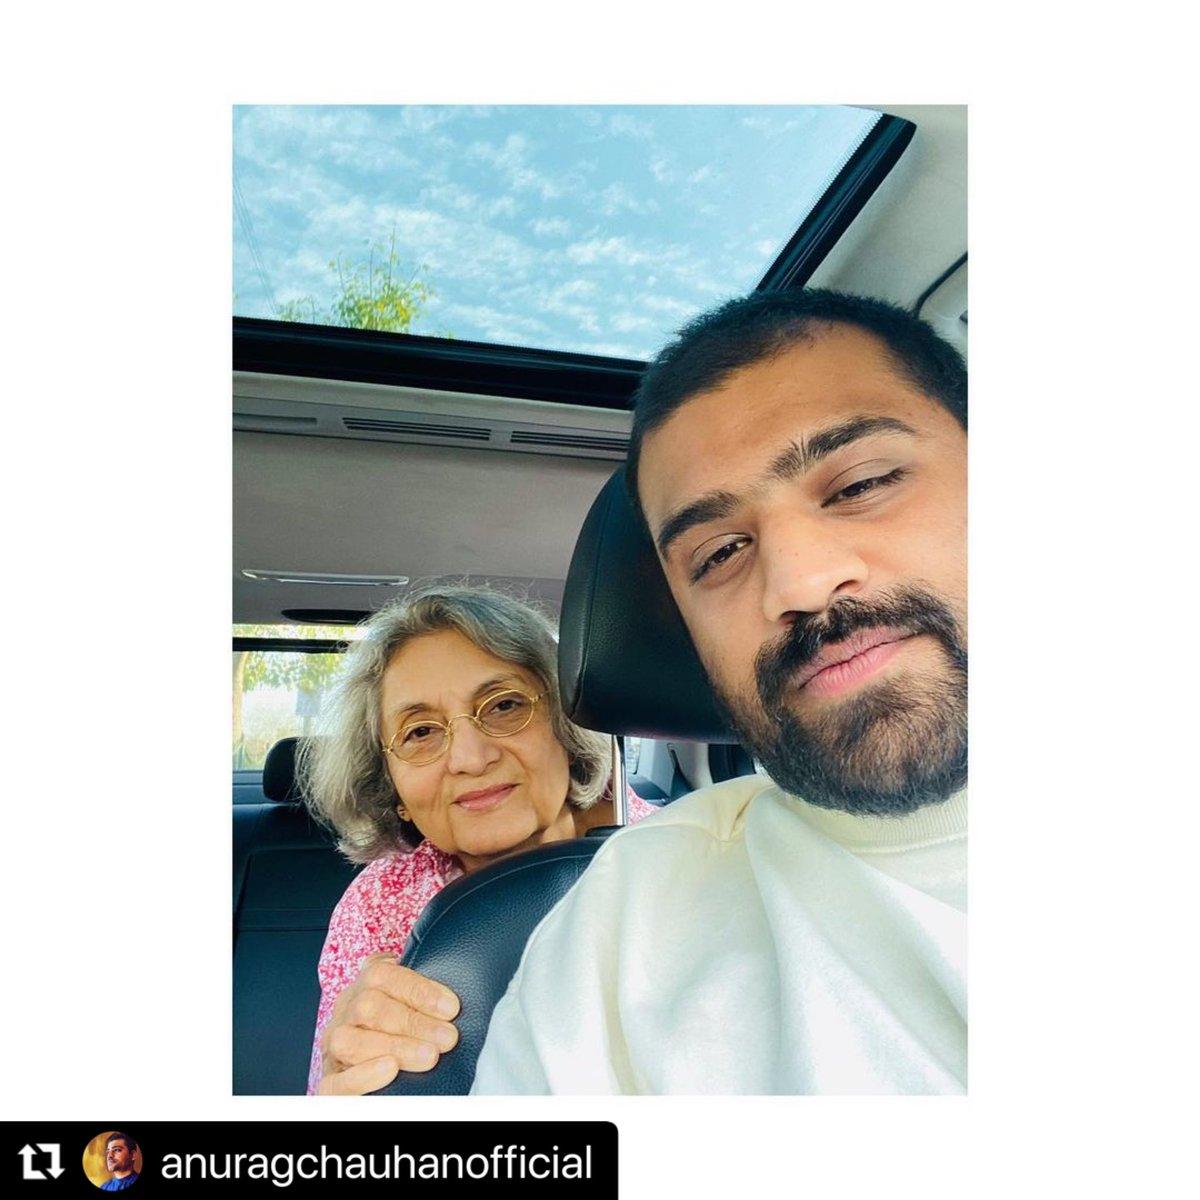 #Repost @anuragchauhanof ・・・ Date with Sheela !! . . . #maanandsheela #date #selfie #friends #girlfriend #smiles